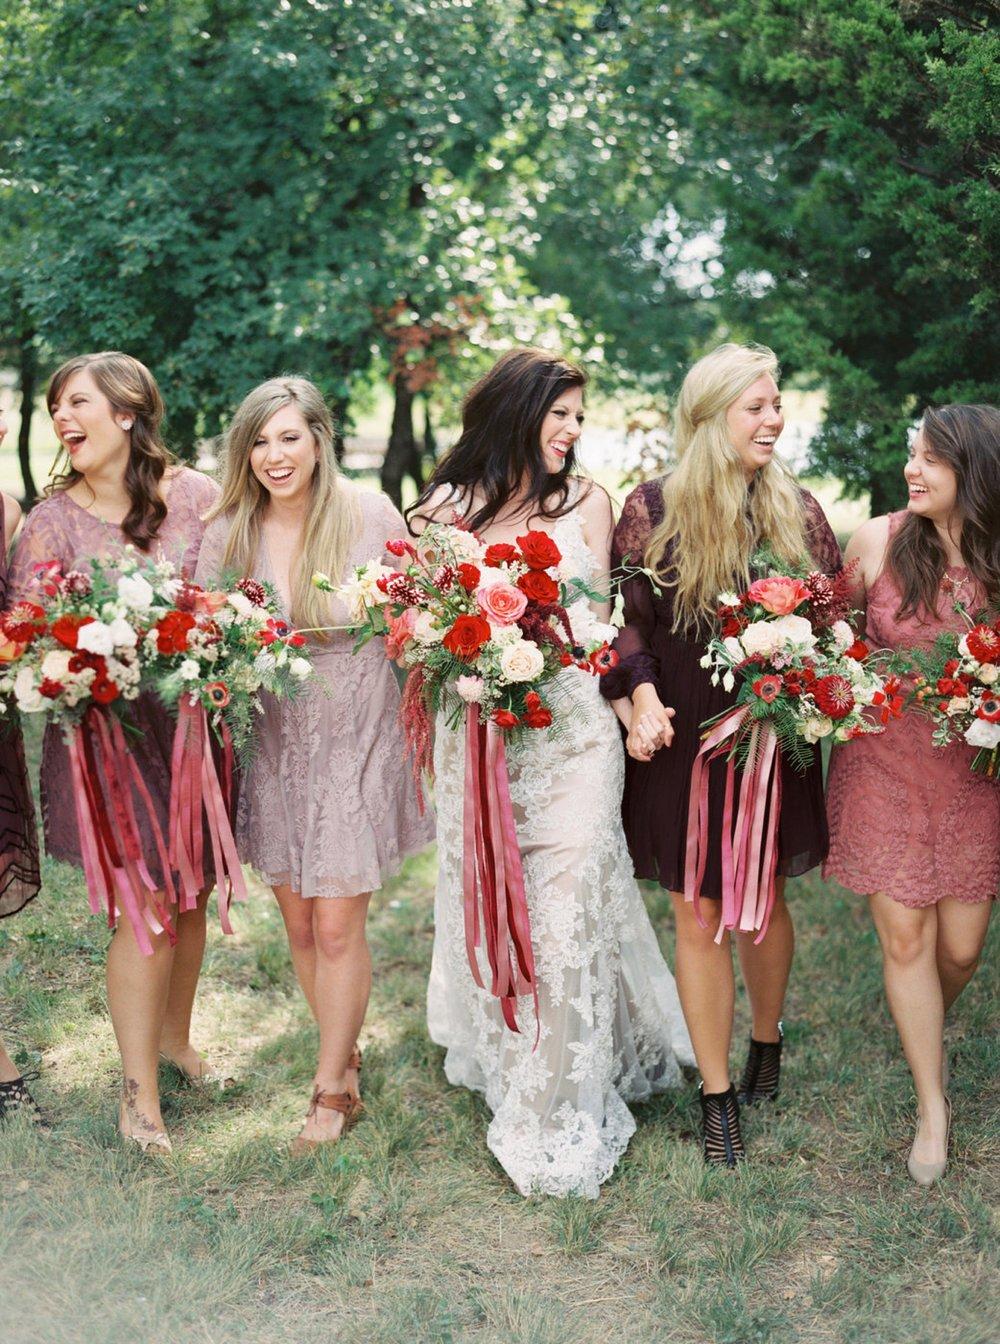 Berry Bridesmaid Dresses, Thistle Springs Ranch Wedding